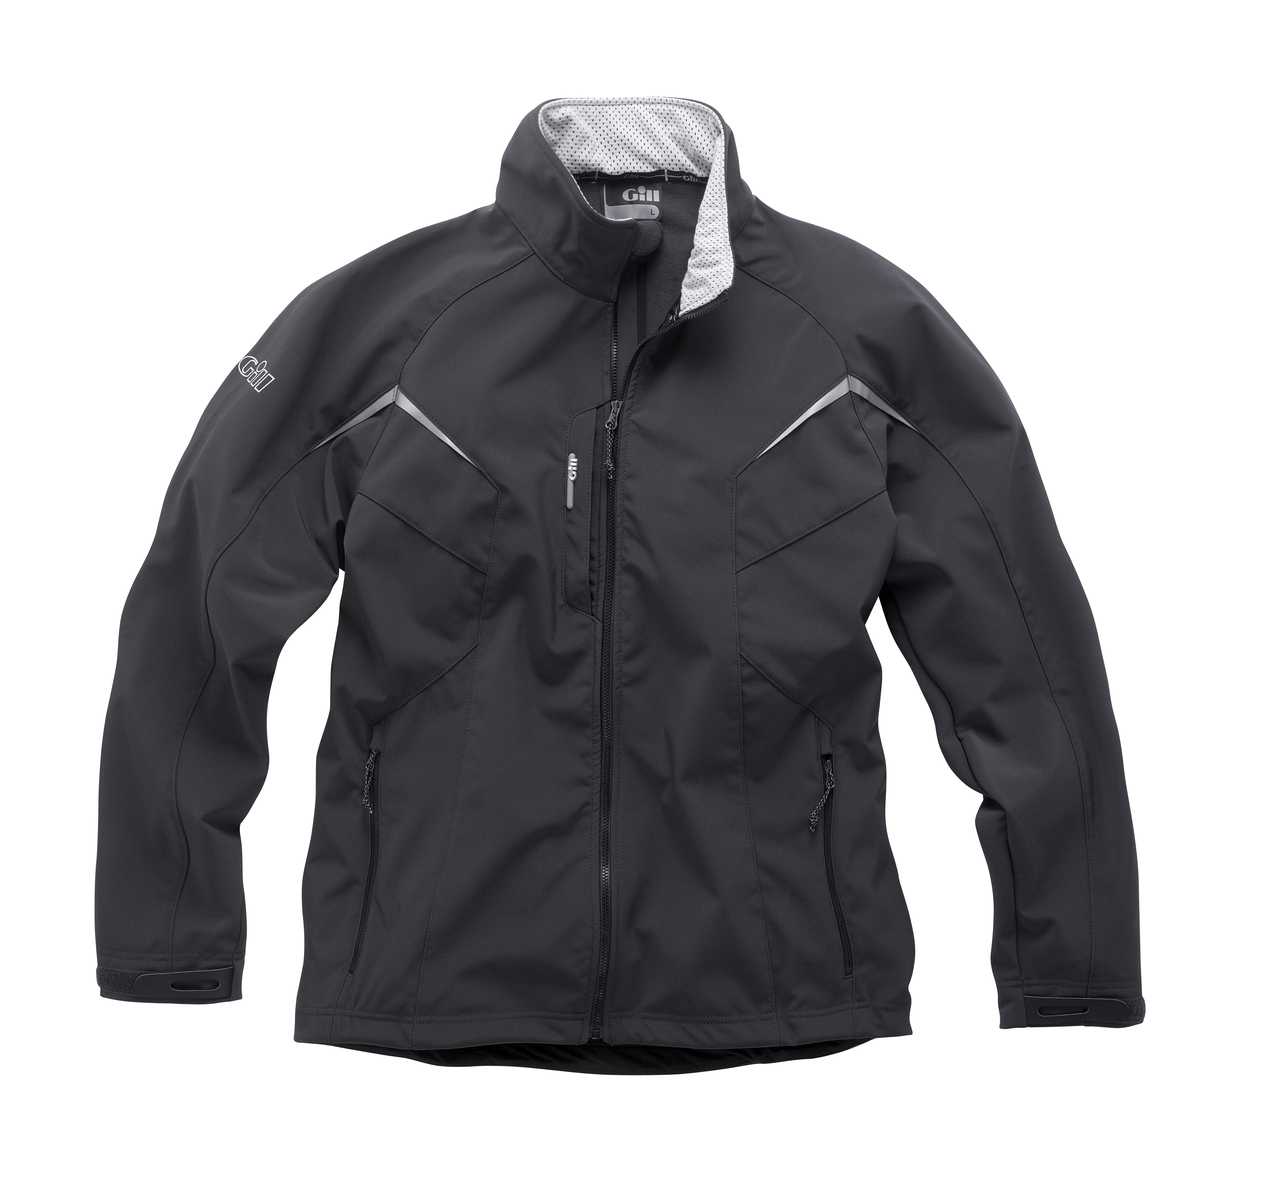 Men's Softshell Sailing Jacket